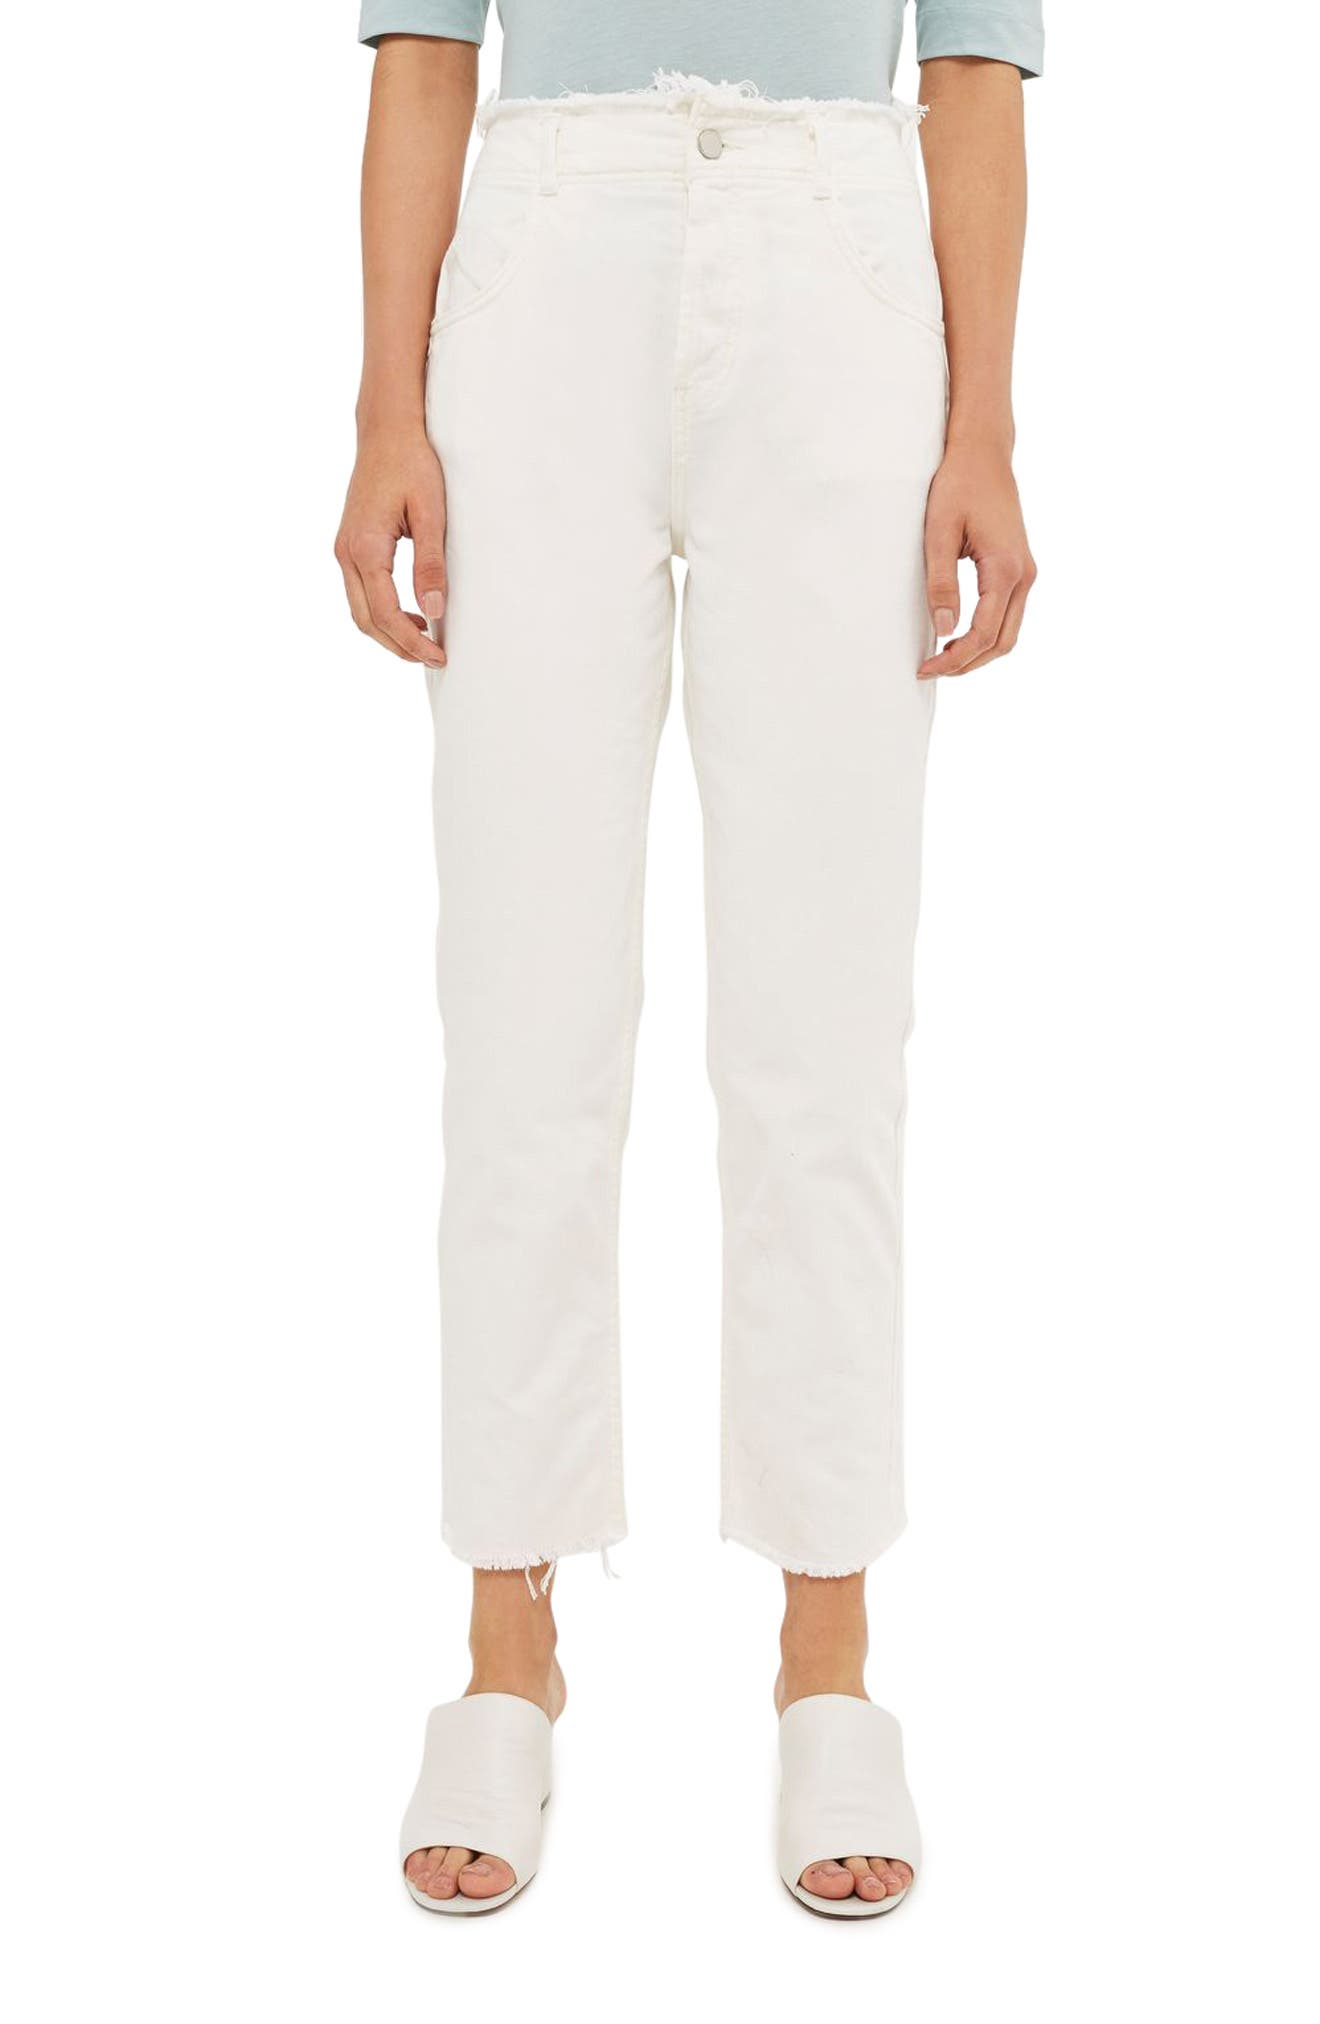 Topshop Boutique High Waist Frayed Hem Jeans